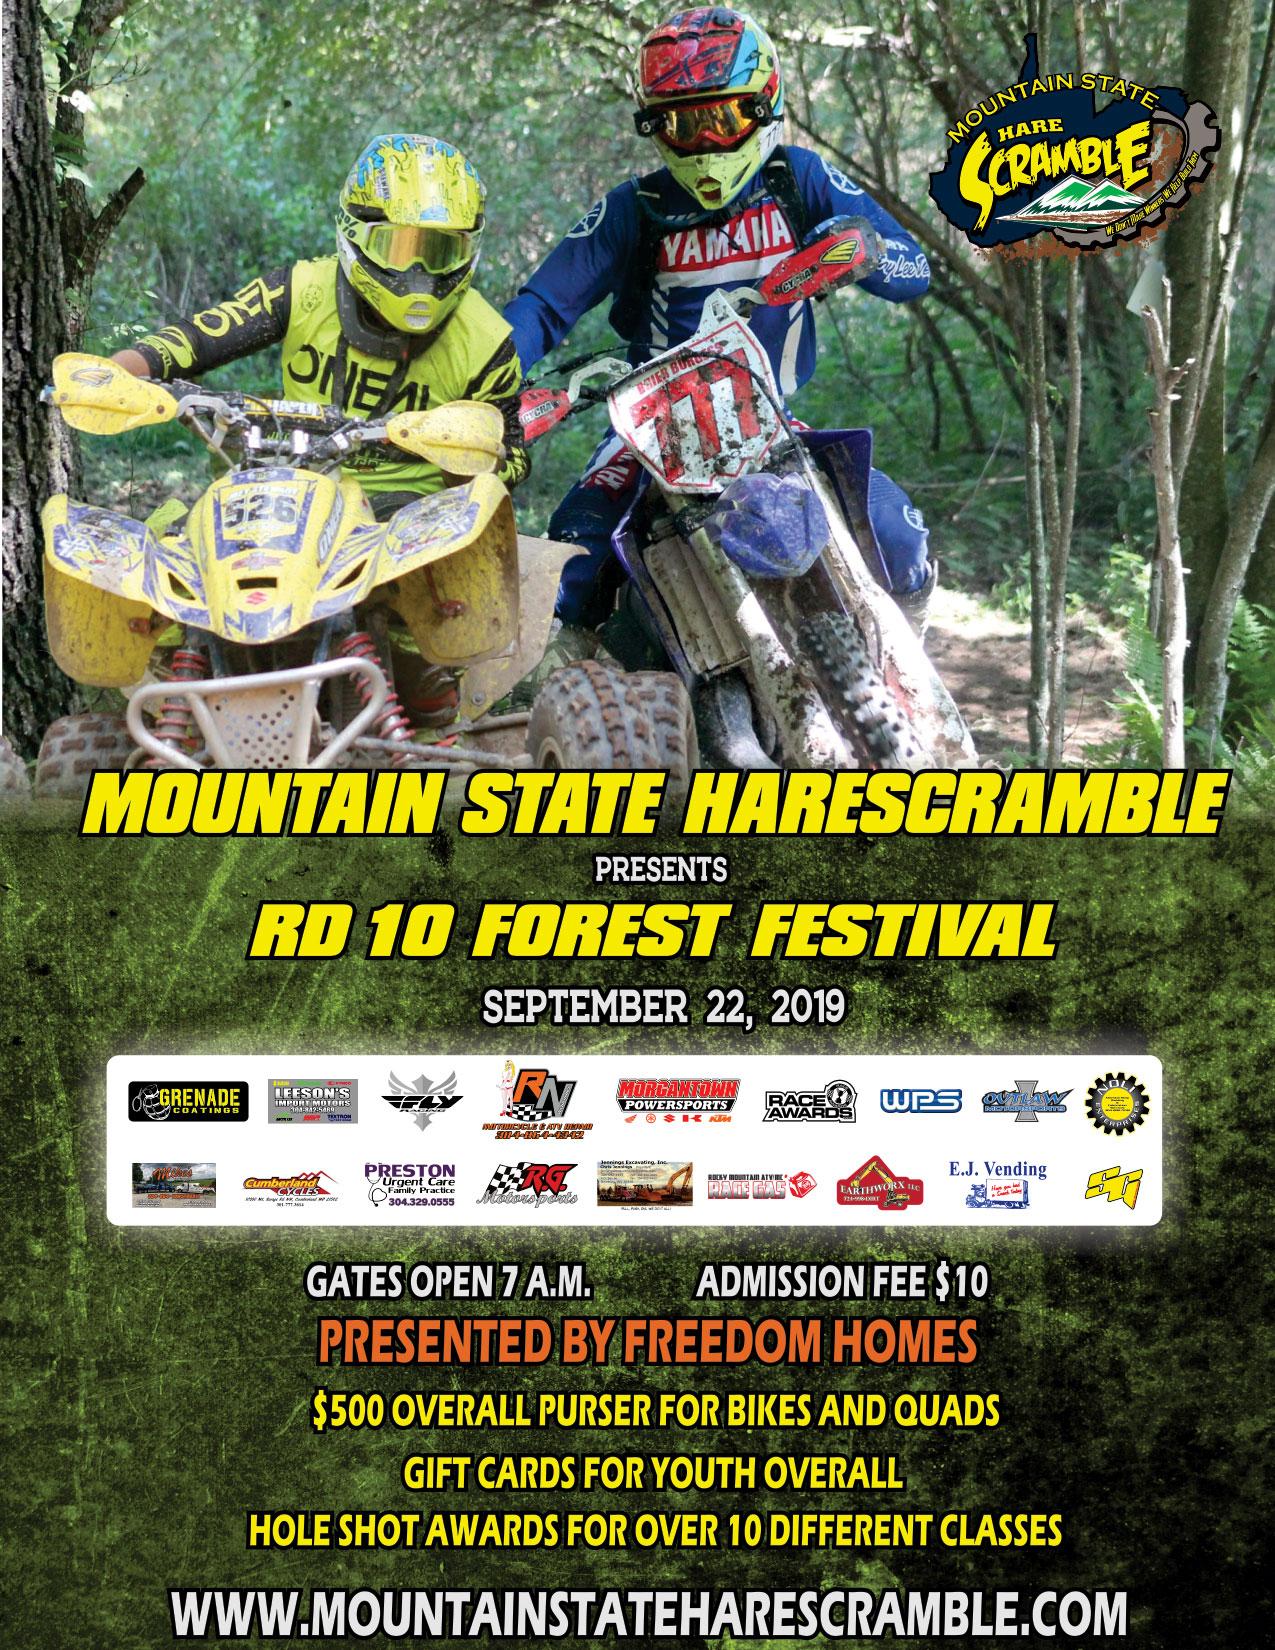 Mountain State Hare Scramble